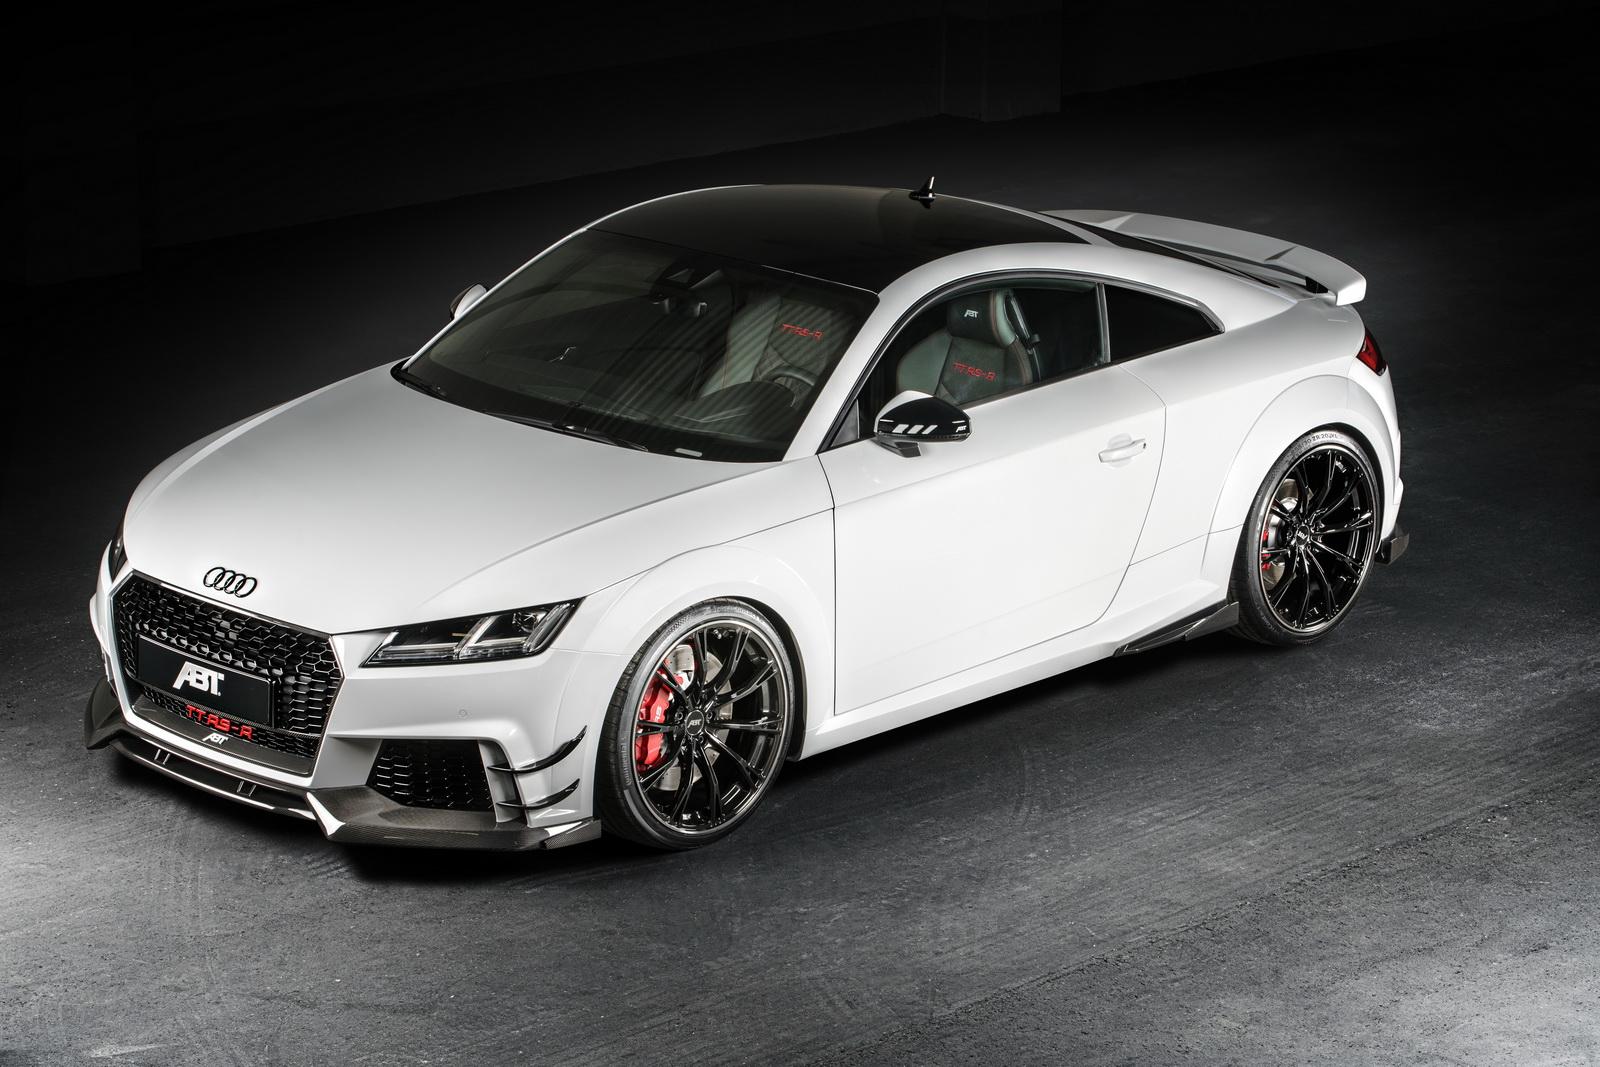 Audi_TT_RS-R_by_ABT_02